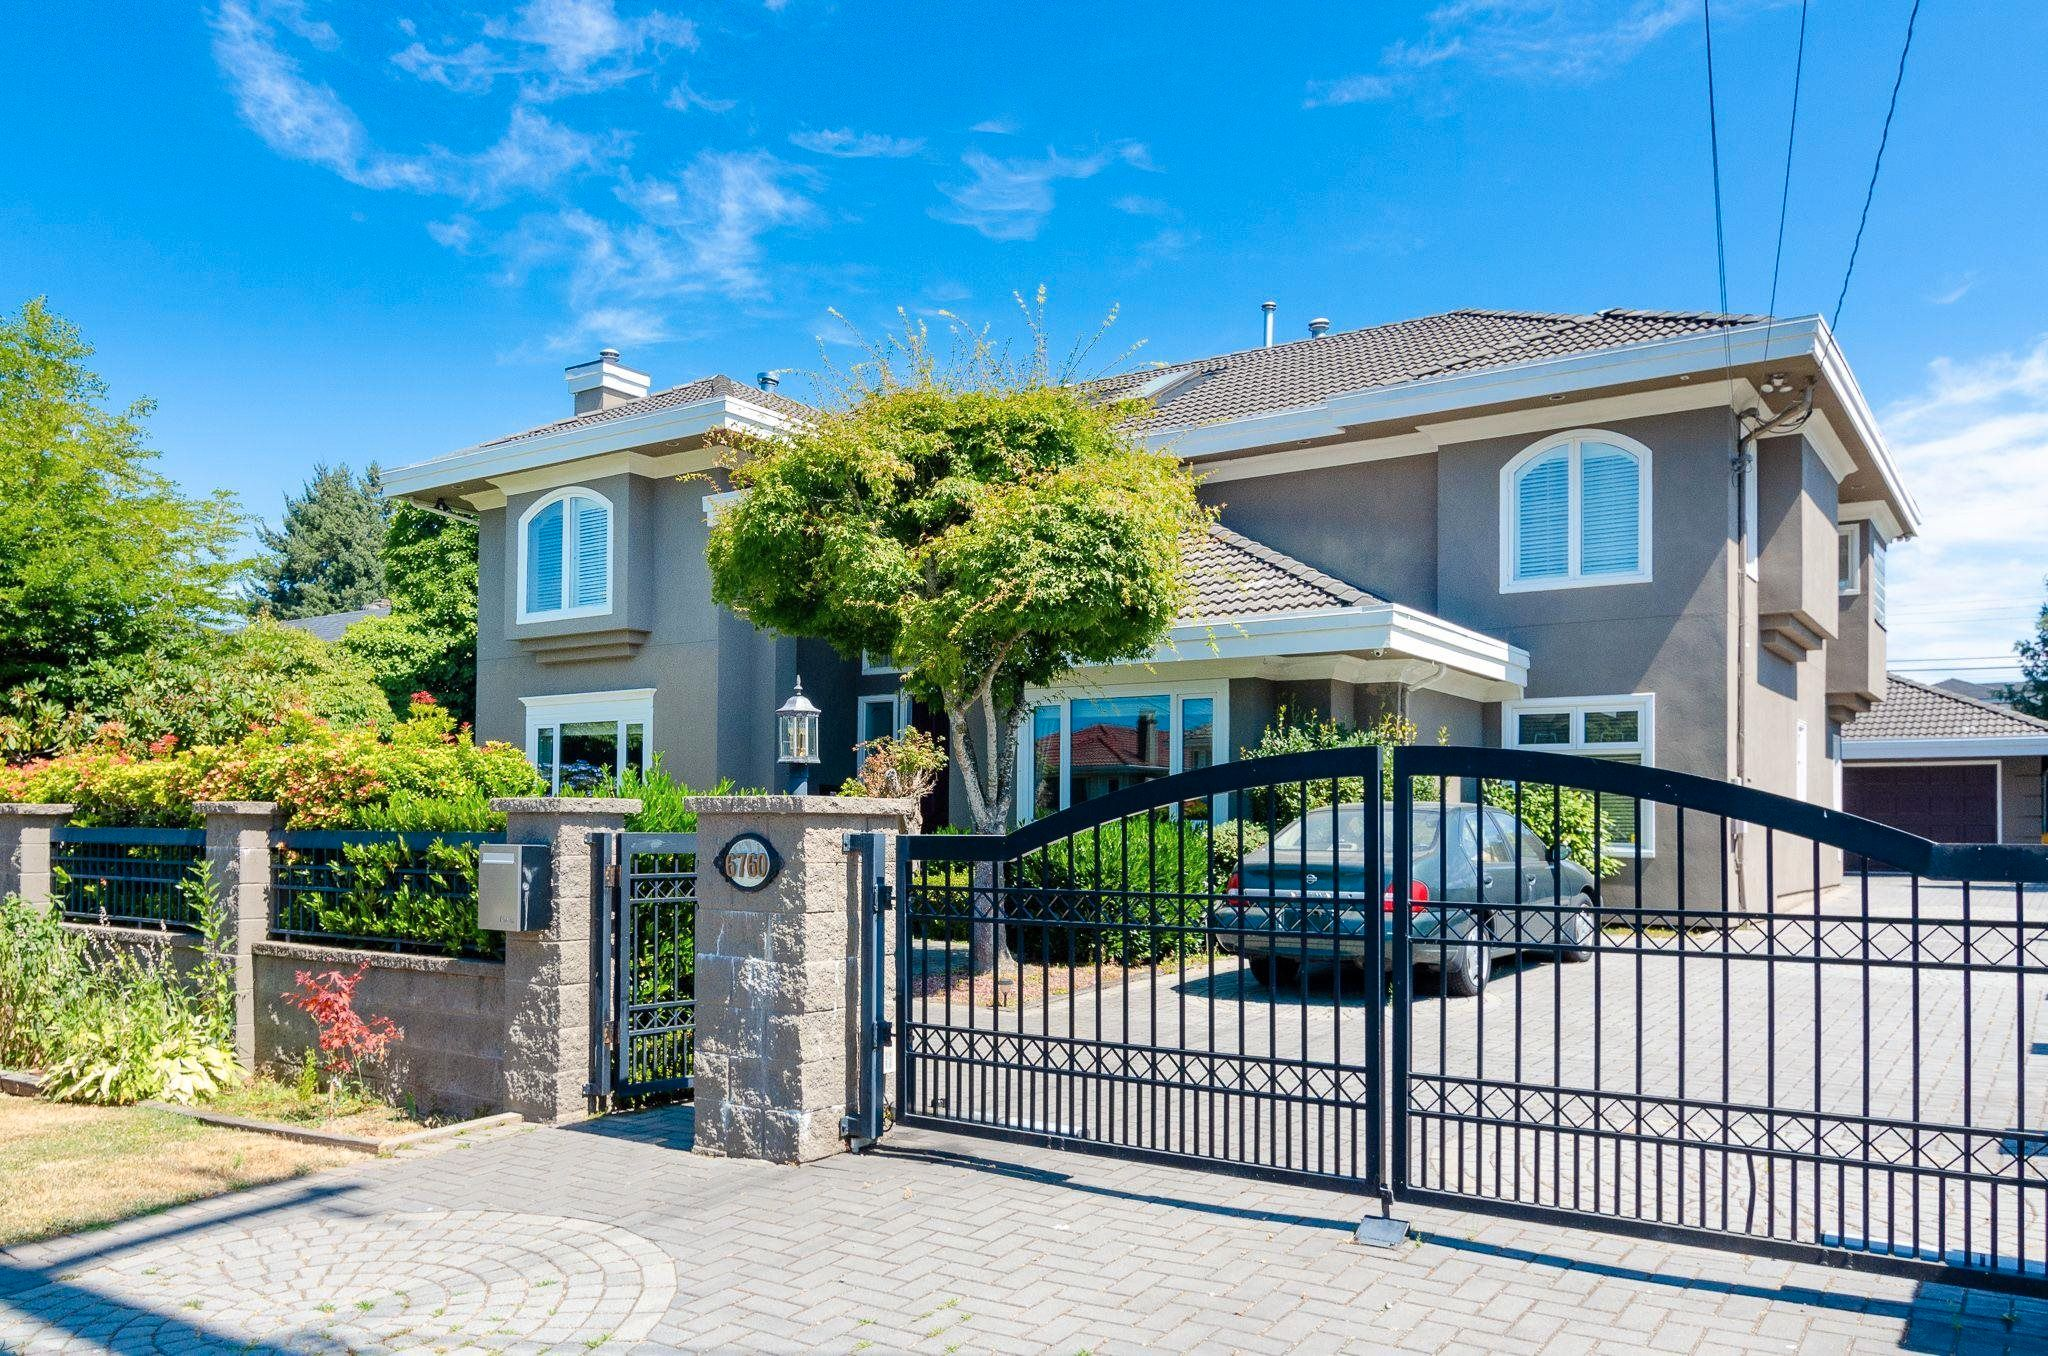 Main Photo: 6760 BRANTFORD Avenue in Burnaby: Upper Deer Lake House for sale (Burnaby South)  : MLS®# R2617587